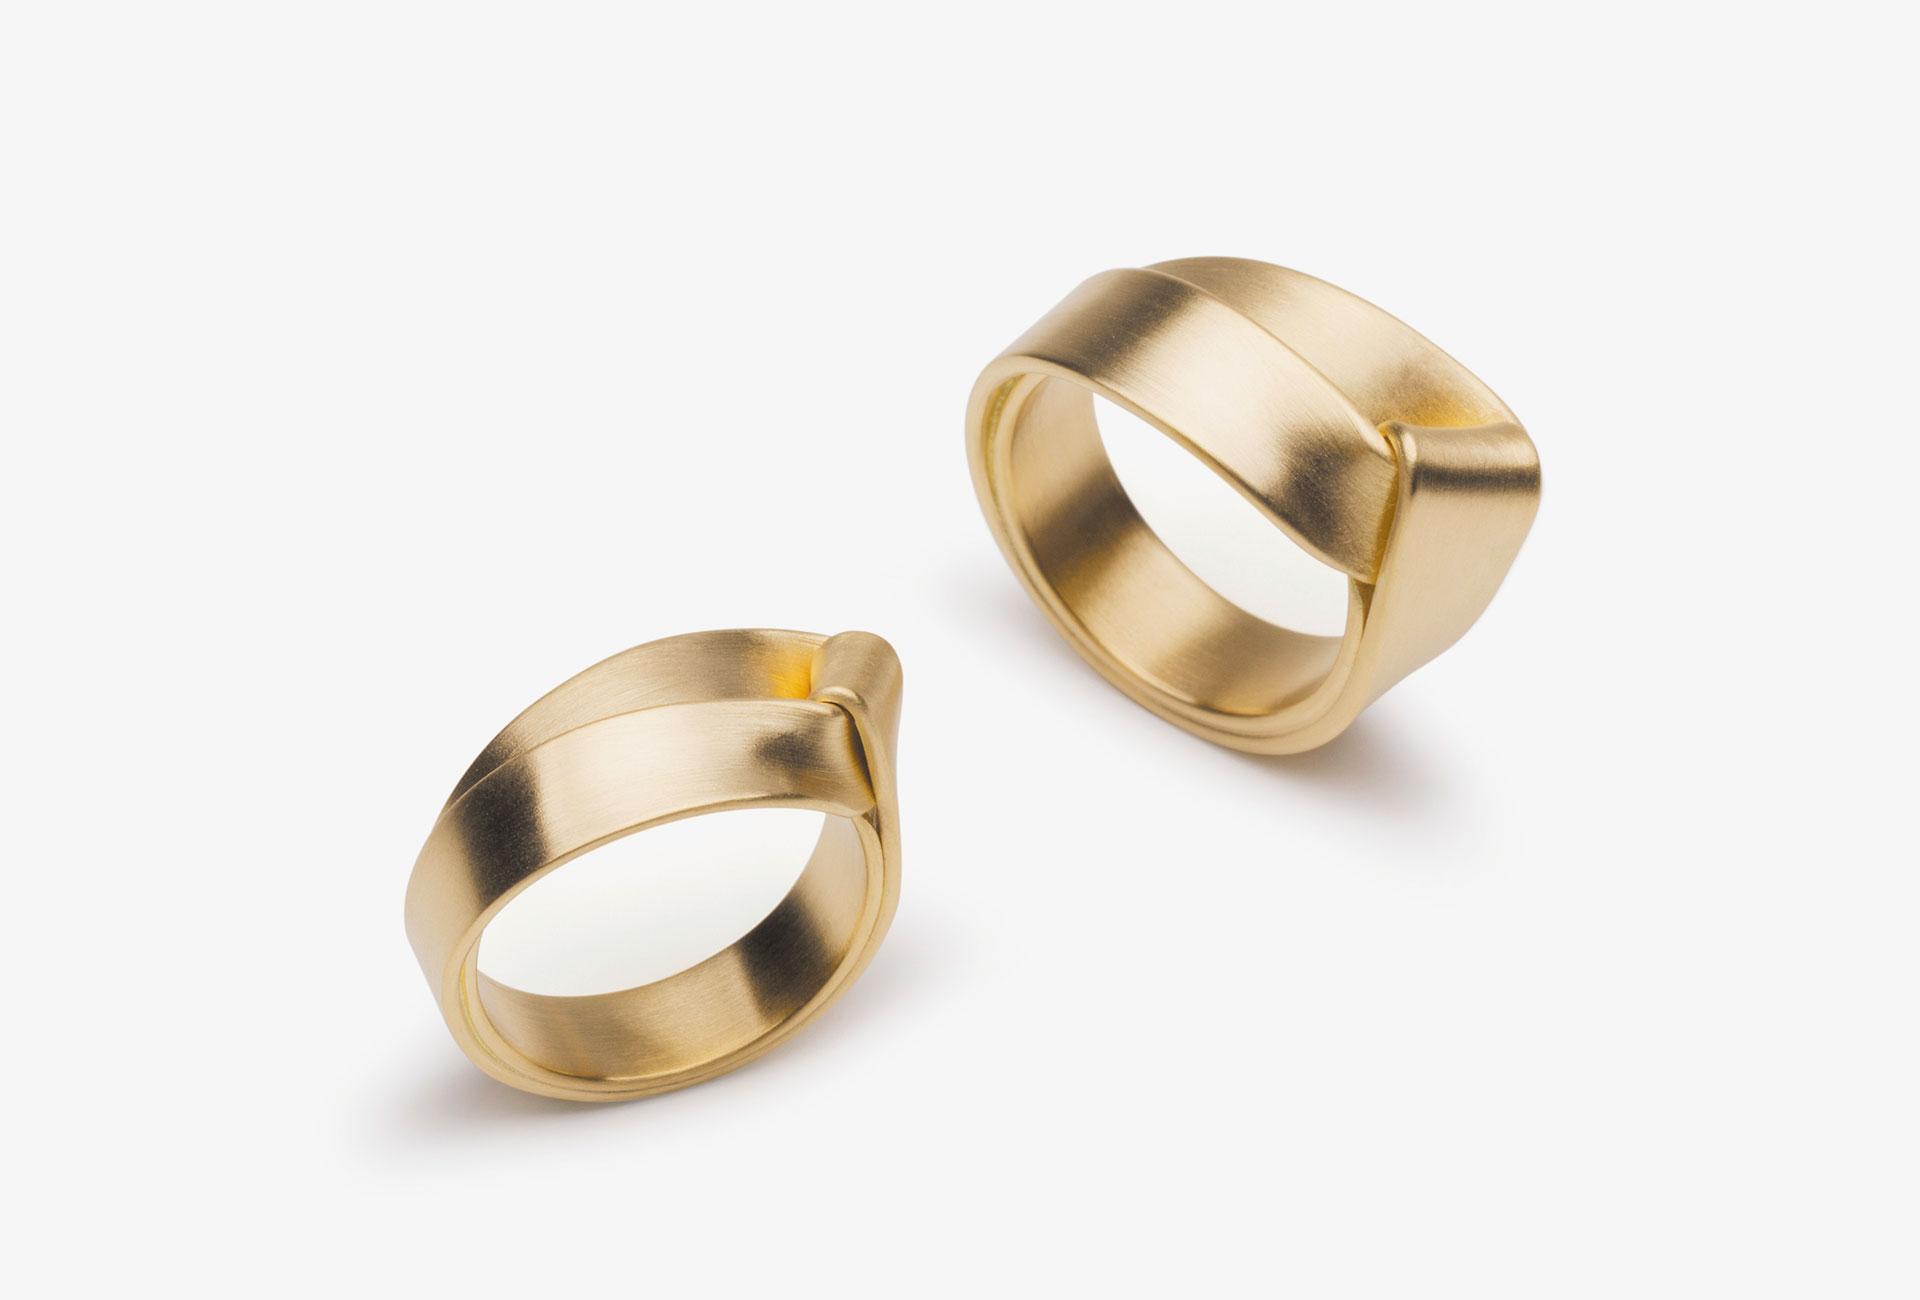 Inhorgenta 2016 – Jewelry Design